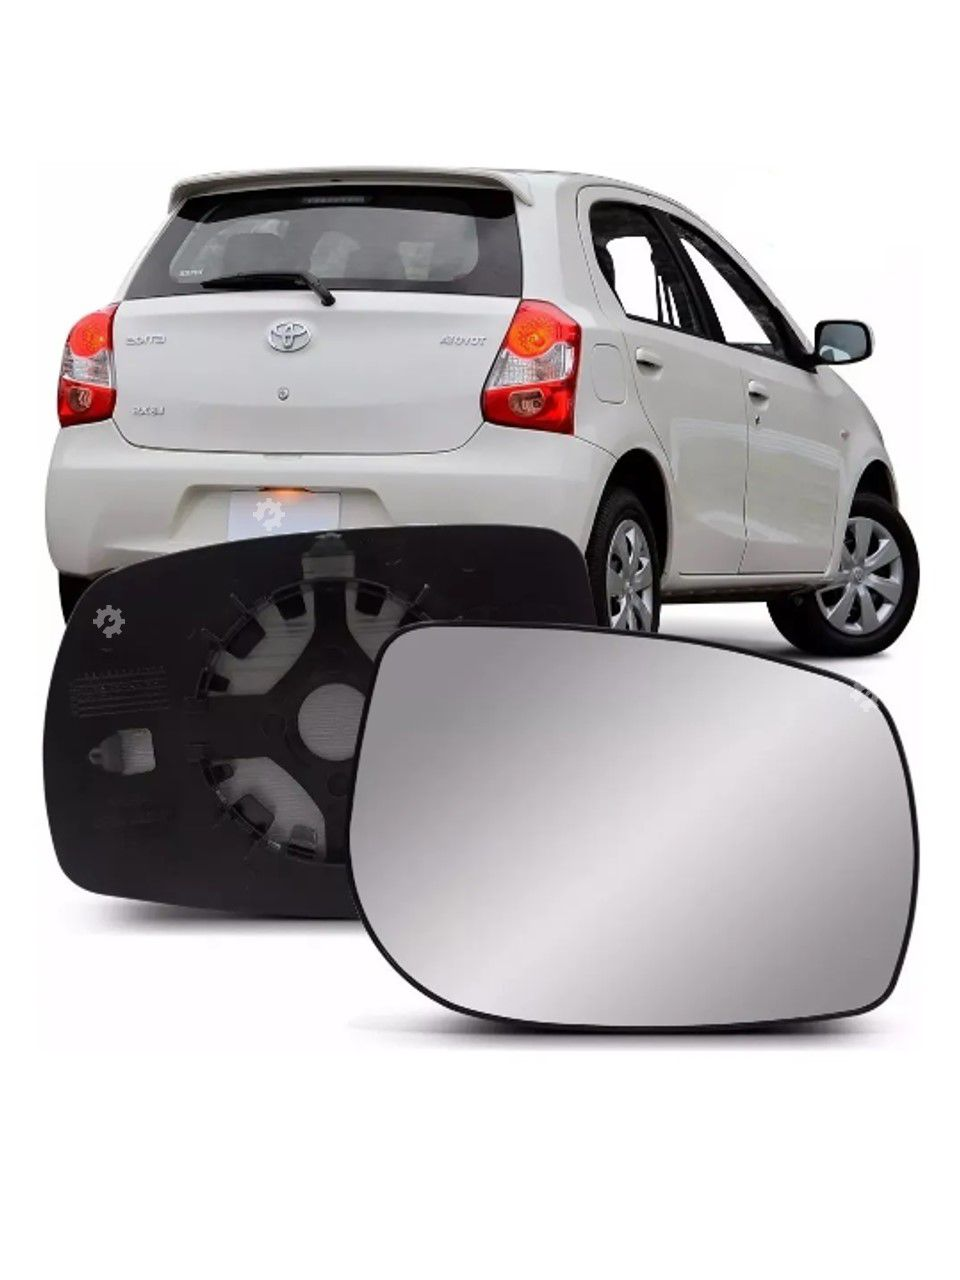 Lente base vidro Retrovisor direito Toyota Etios 2012 2013